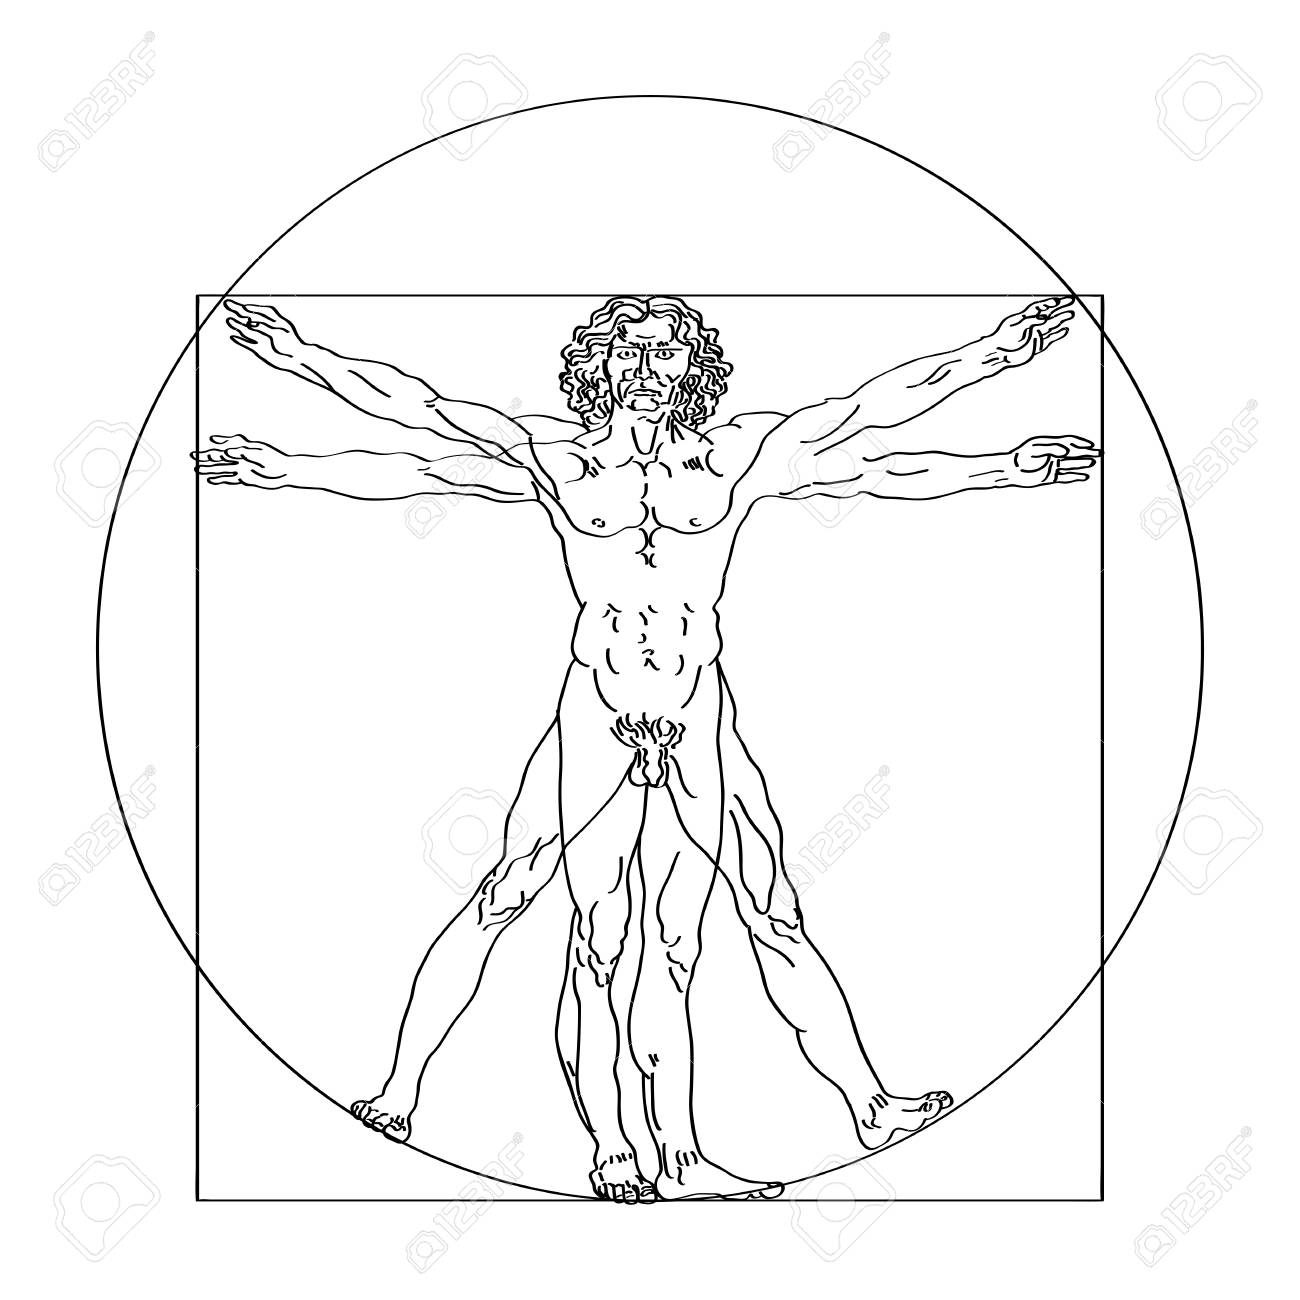 Stylized sketch of the Vitruvian man or Leonardo's man. Homo vitruviano vector illustration based on Leonardo da Vinci artwork - 105020727